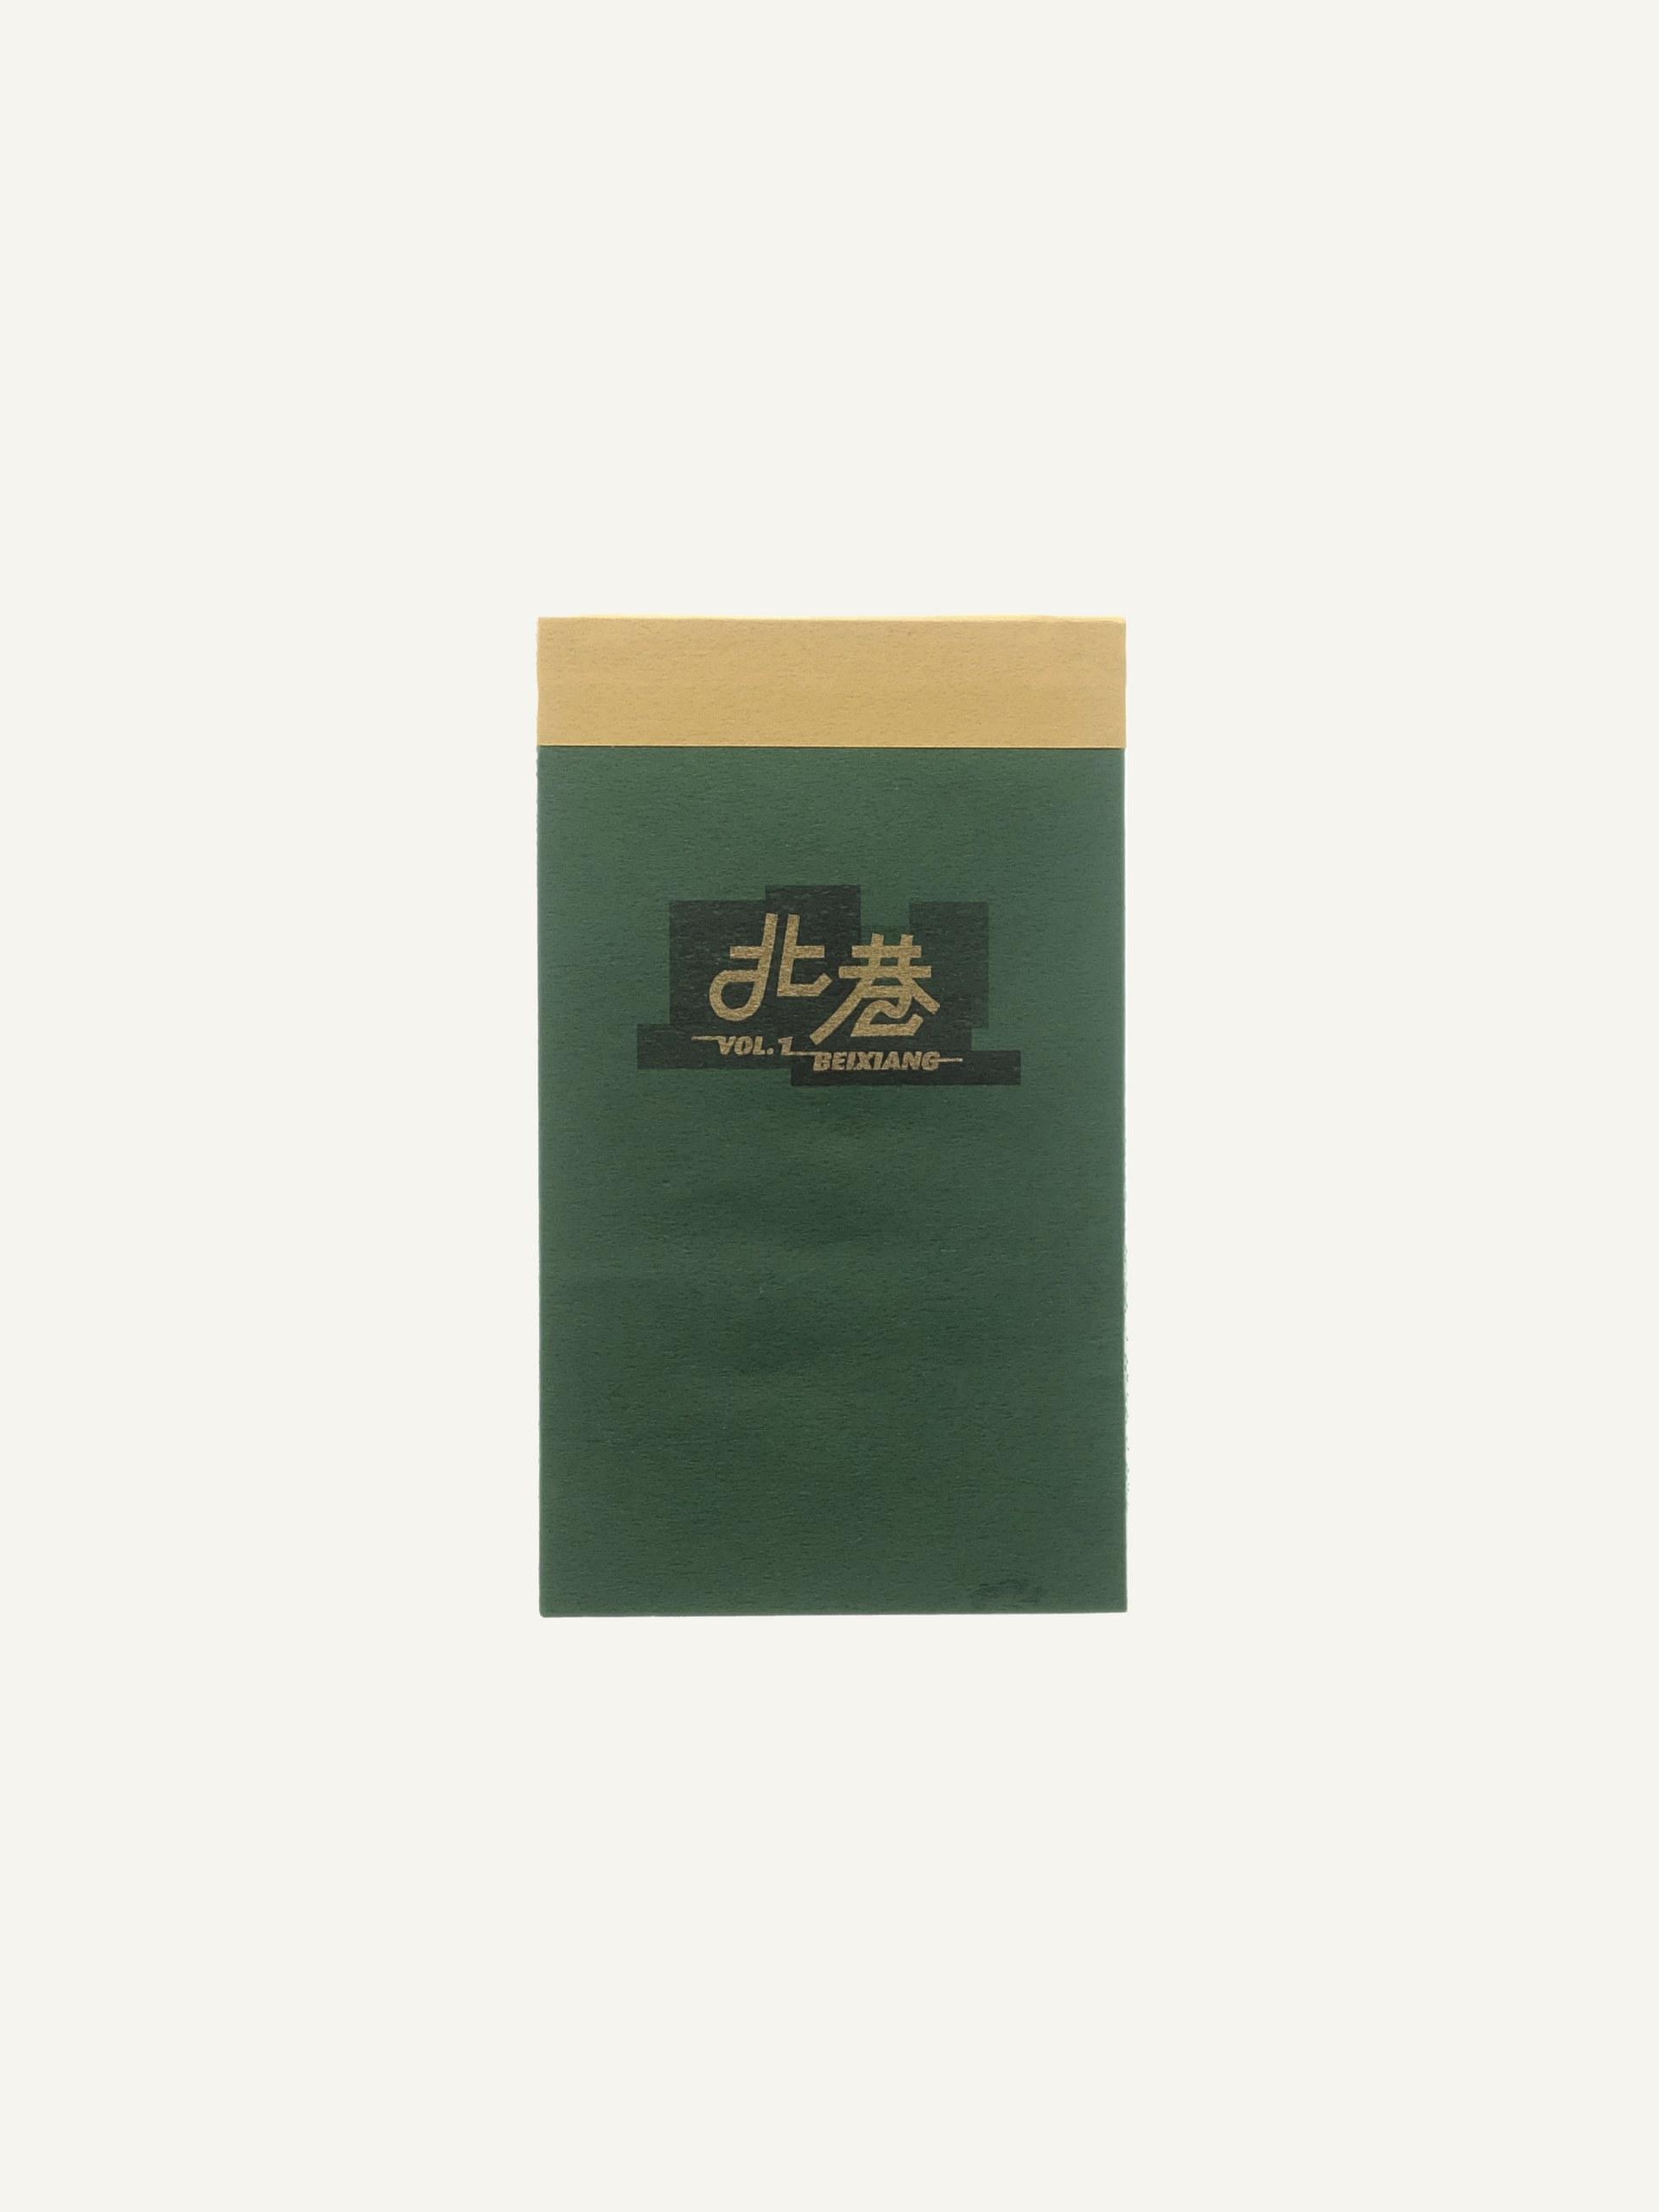 Beixiang Vol.1 Cover